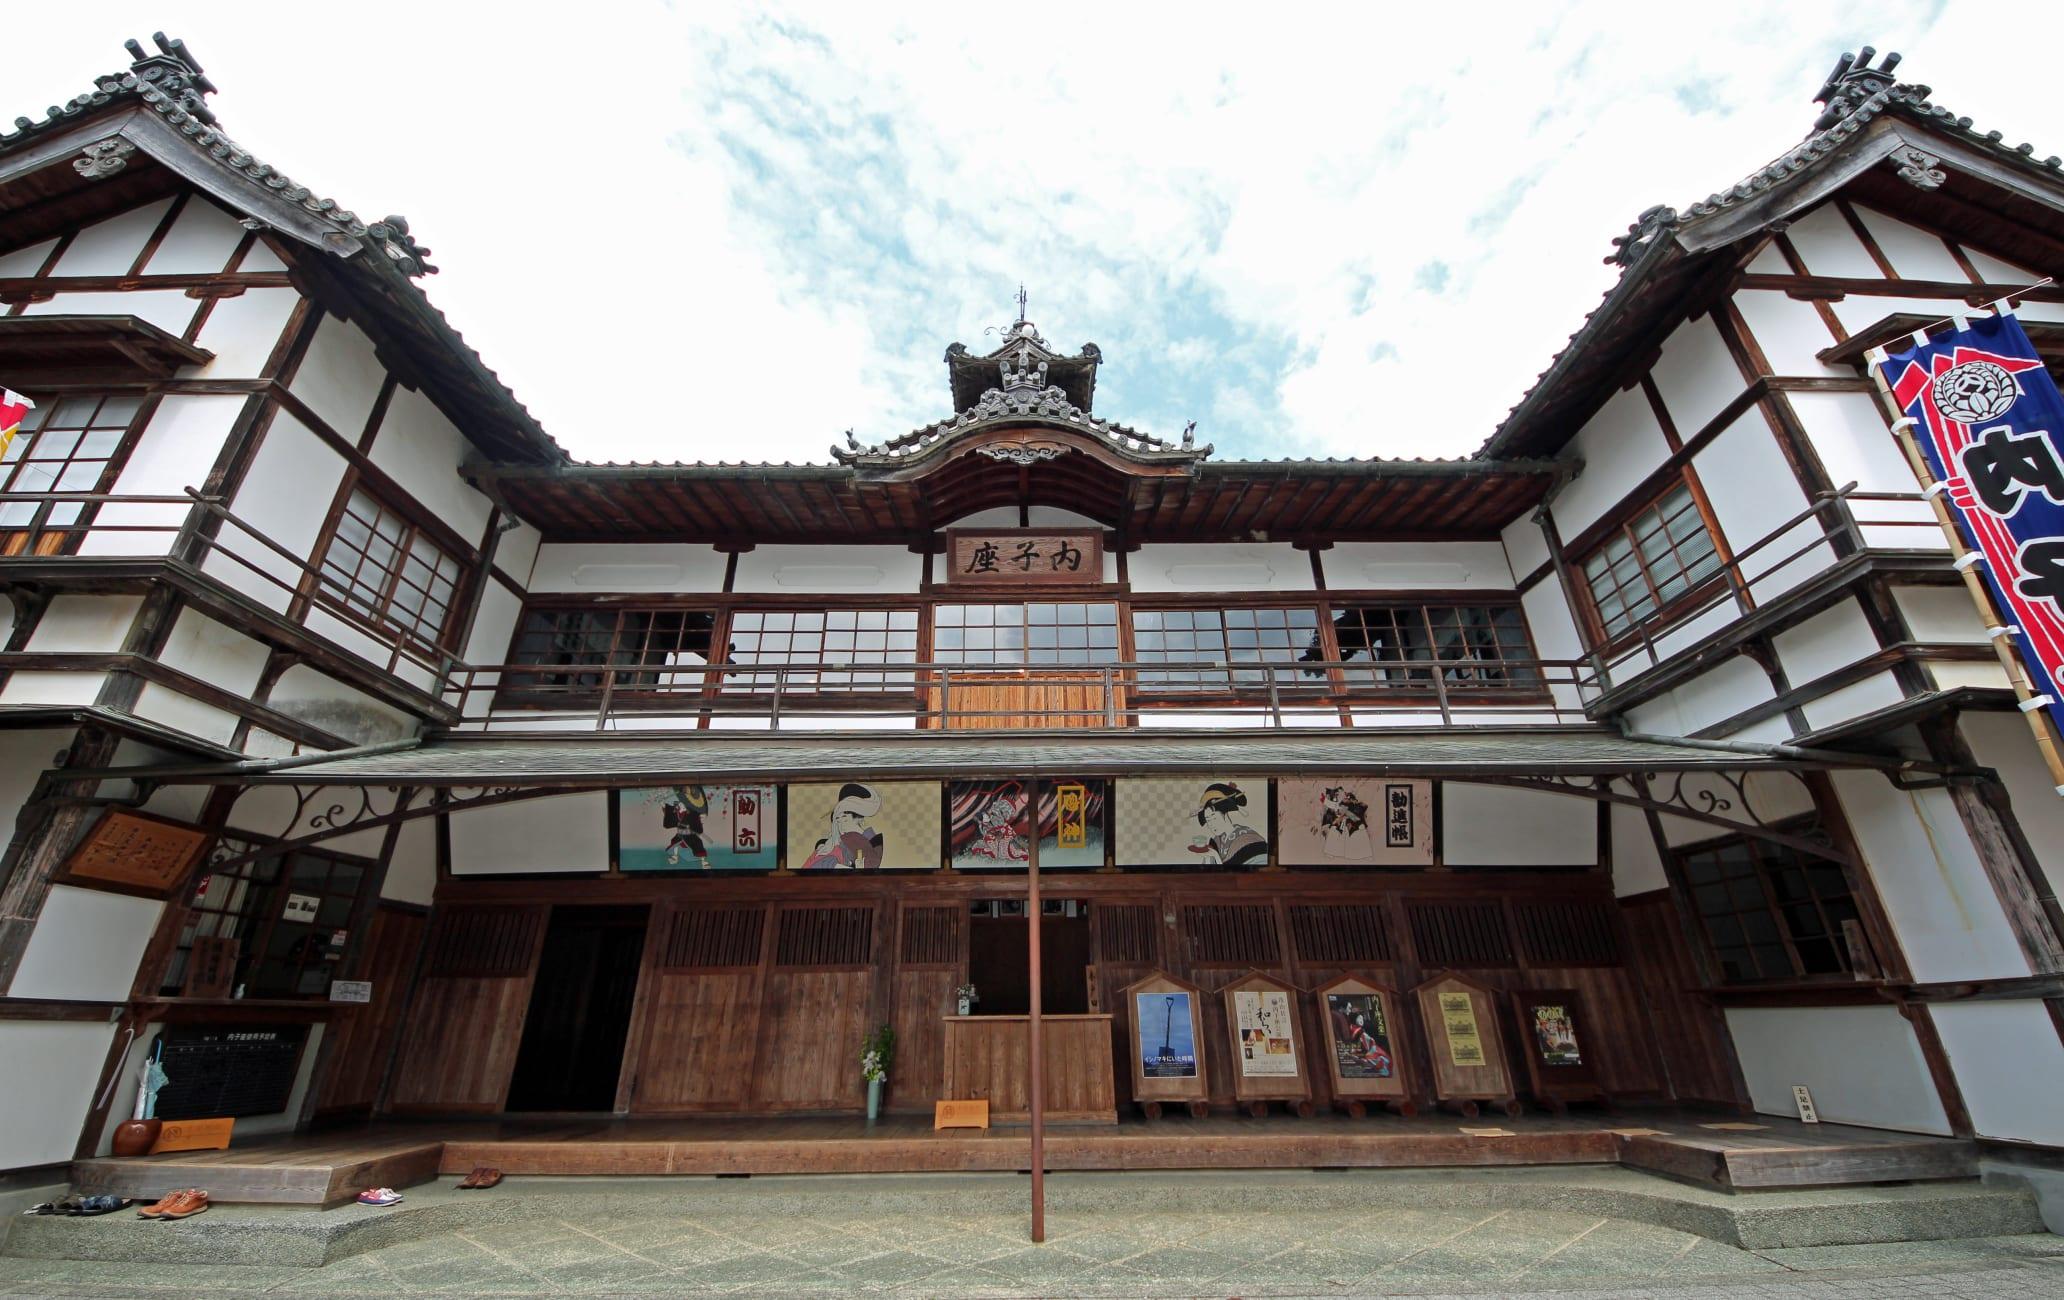 Uchiko-za Kabuki Theater